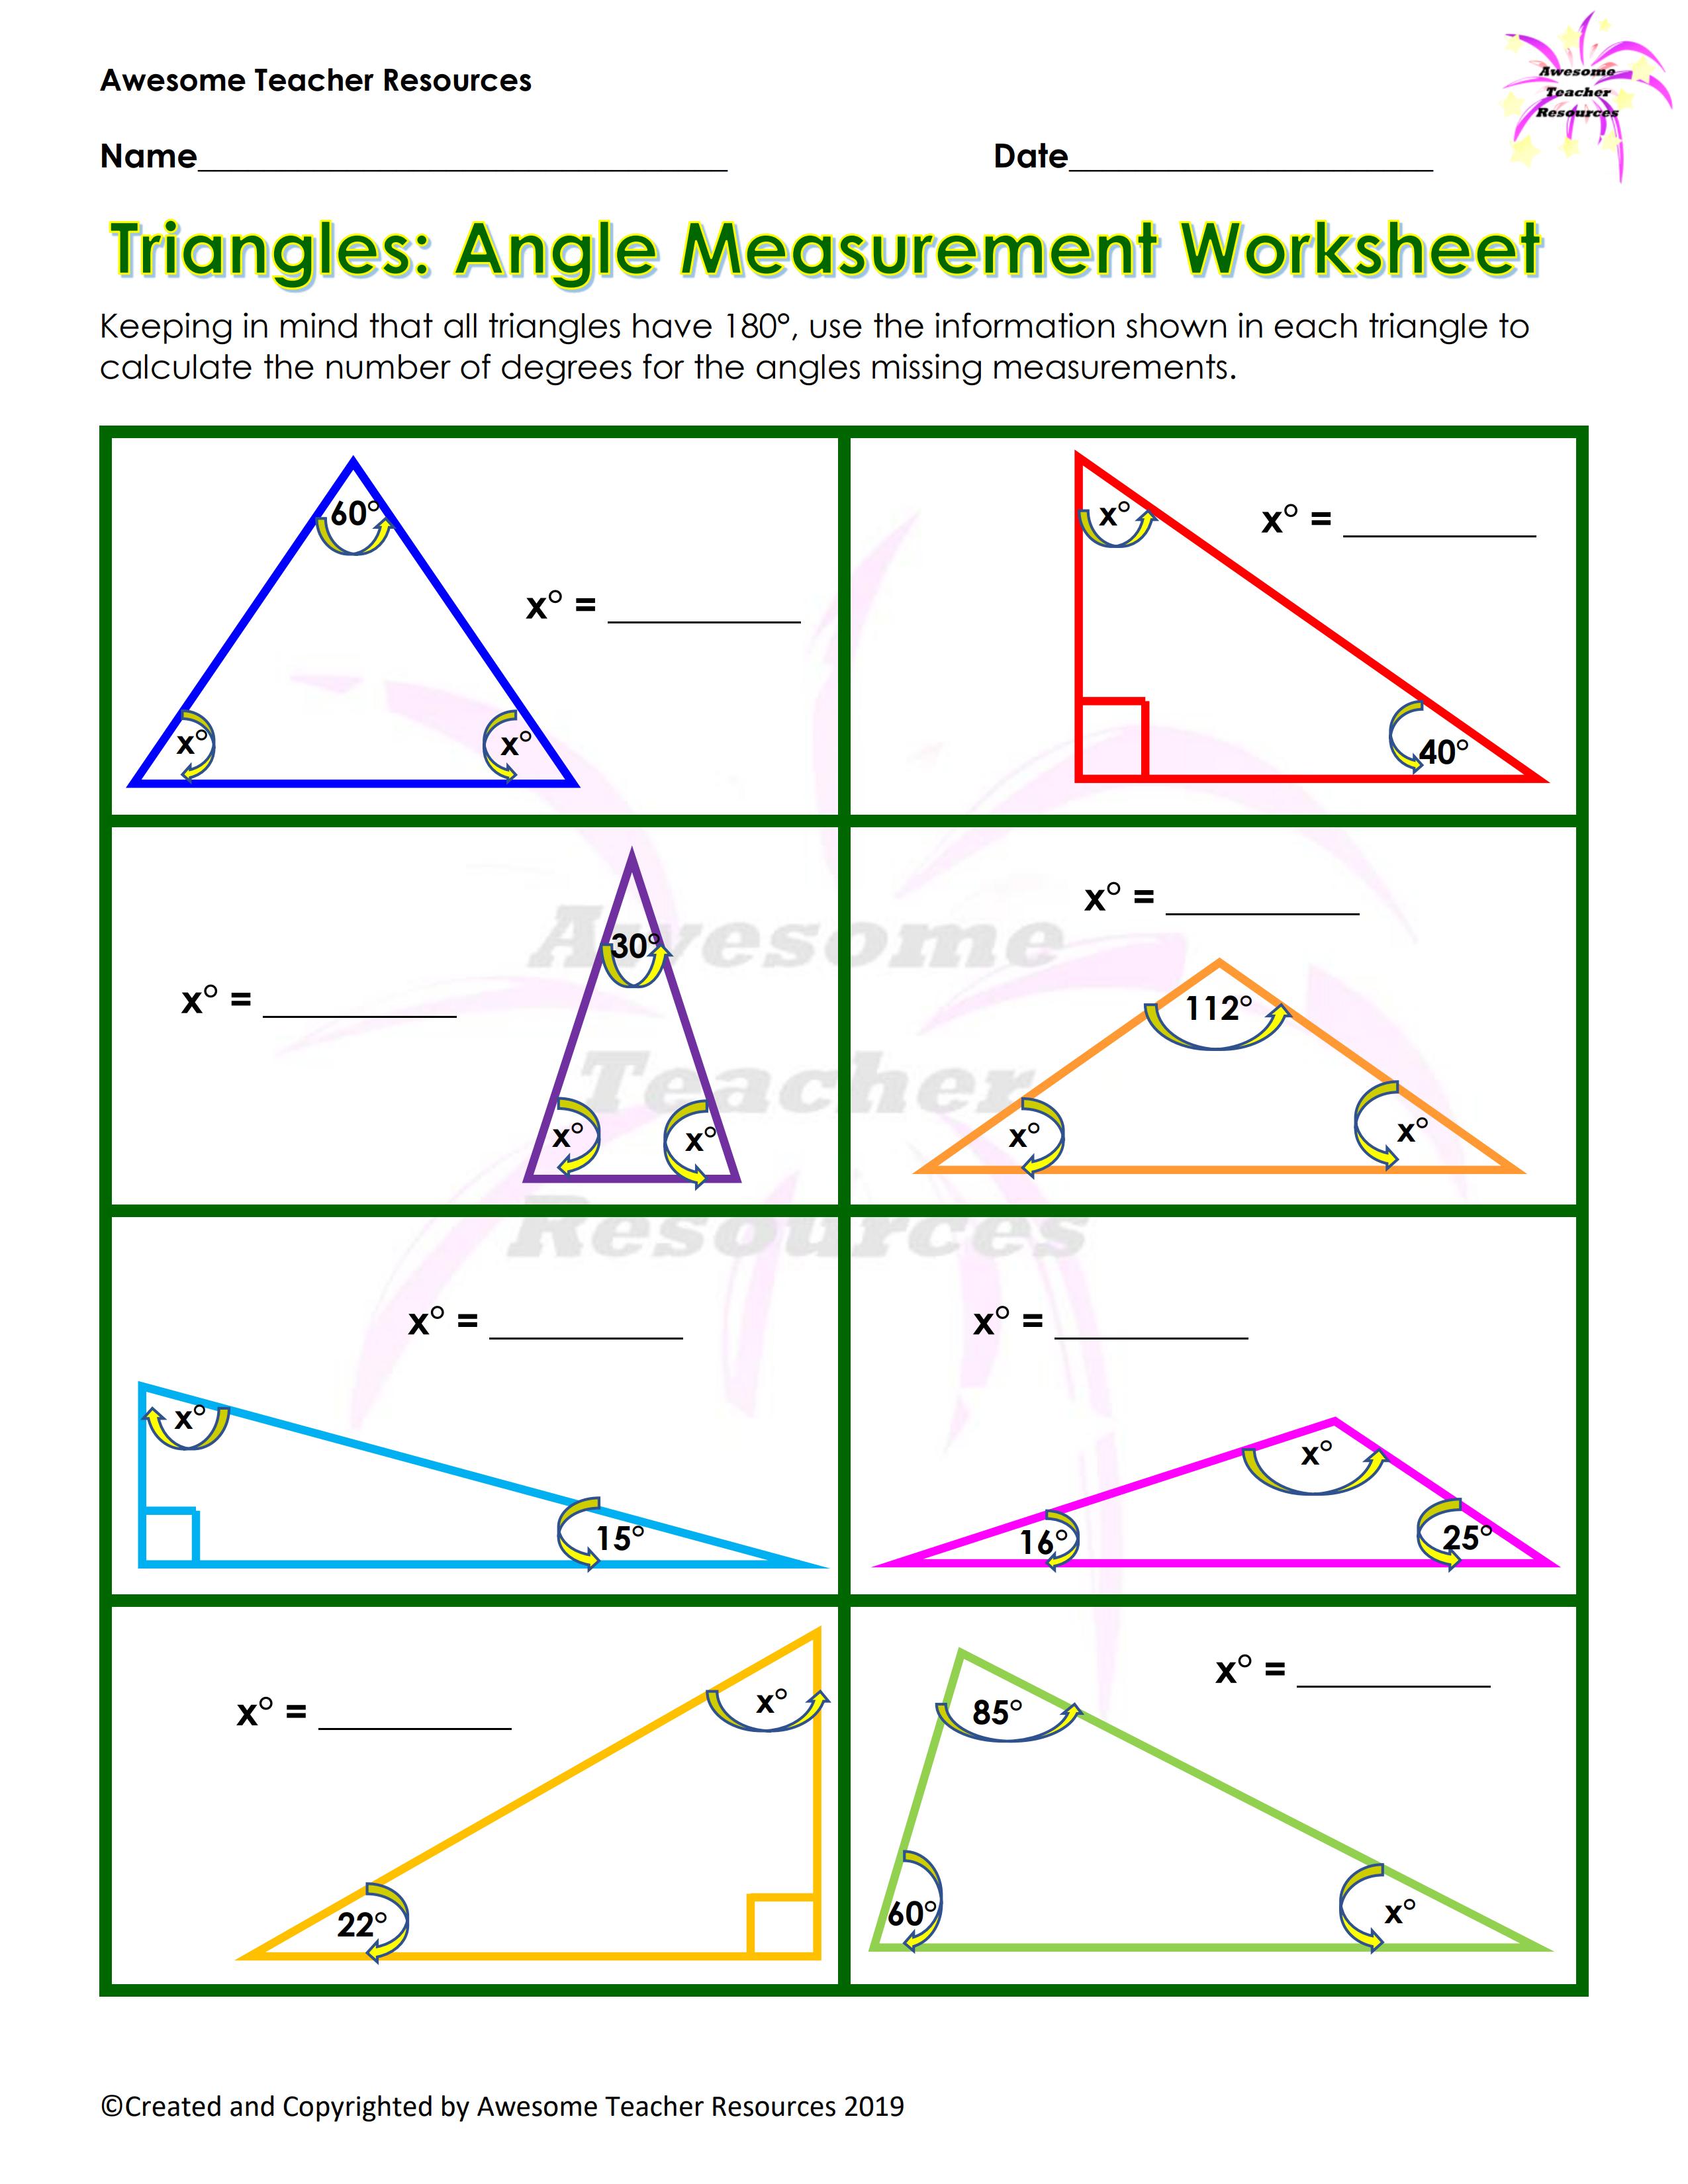 Triangles Angle Measurement Worksheet Measurement Worksheets Measuring Angles Worksheets